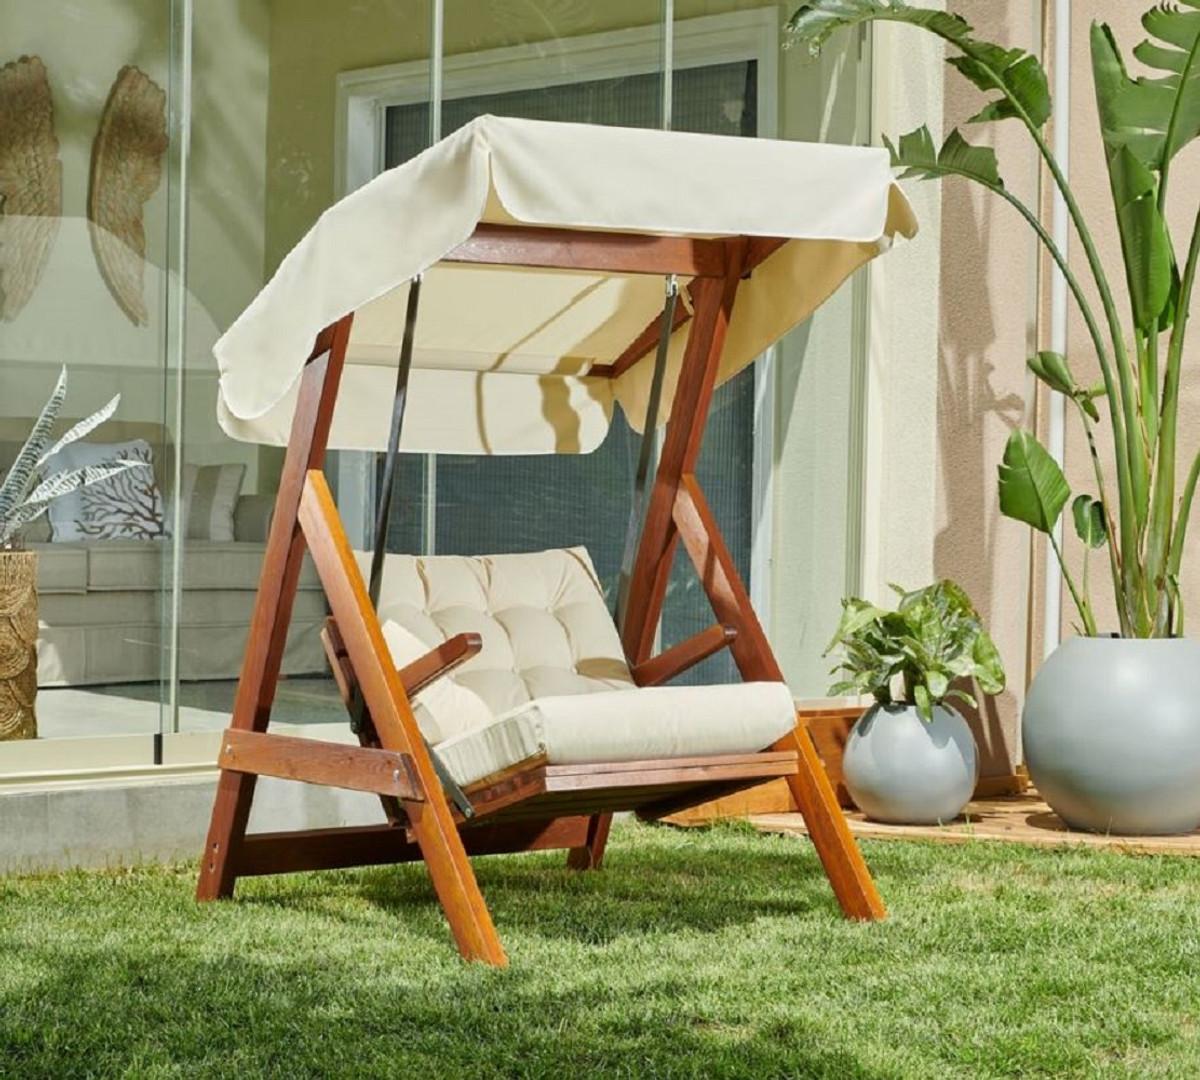 casa padrino luxury hollywood swing cream brown modern weatherproof garden swing with sun roof patio furniture garden furniture luxury